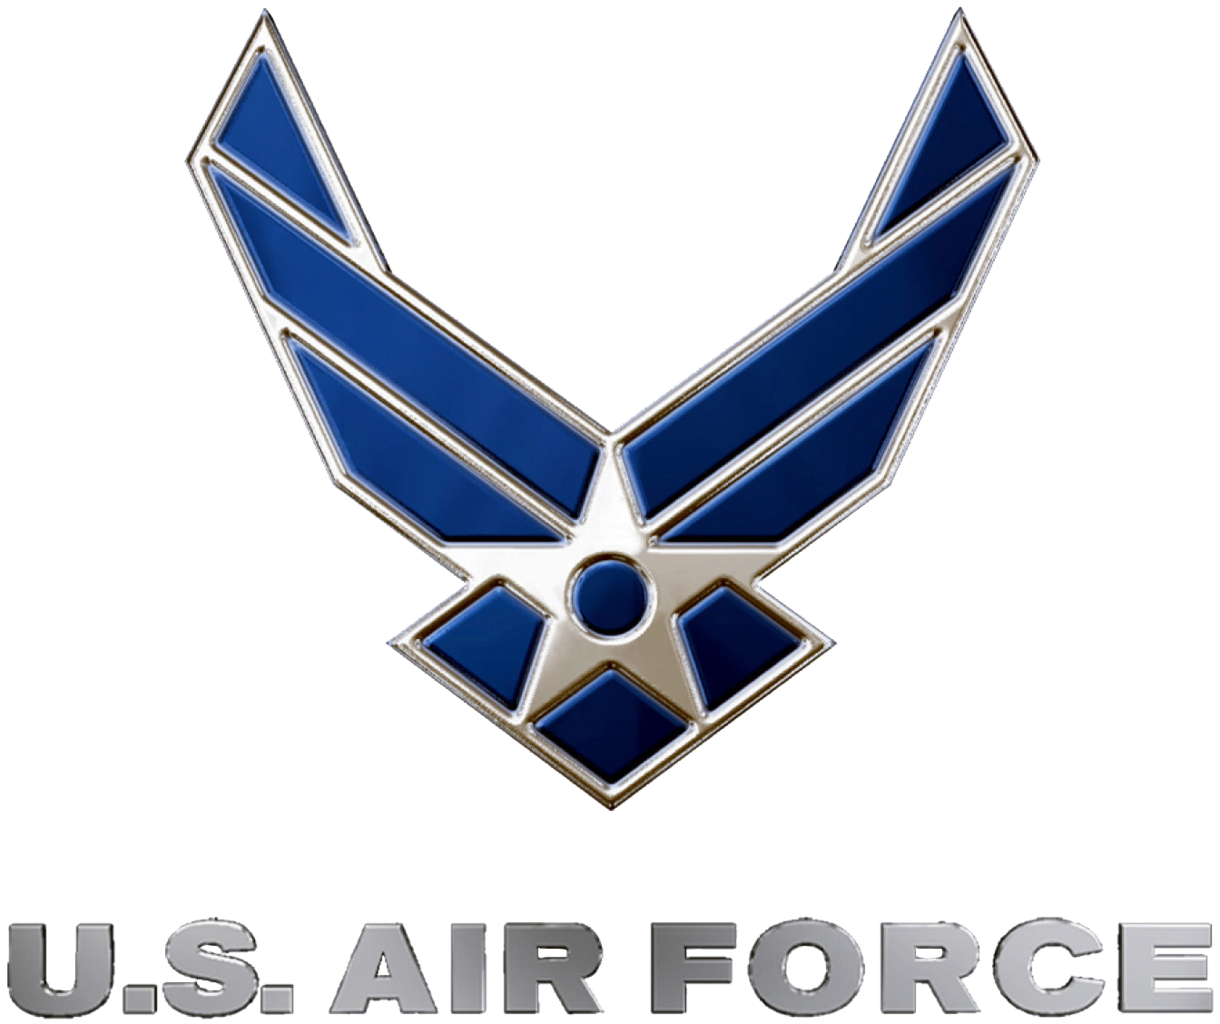 07 USAF